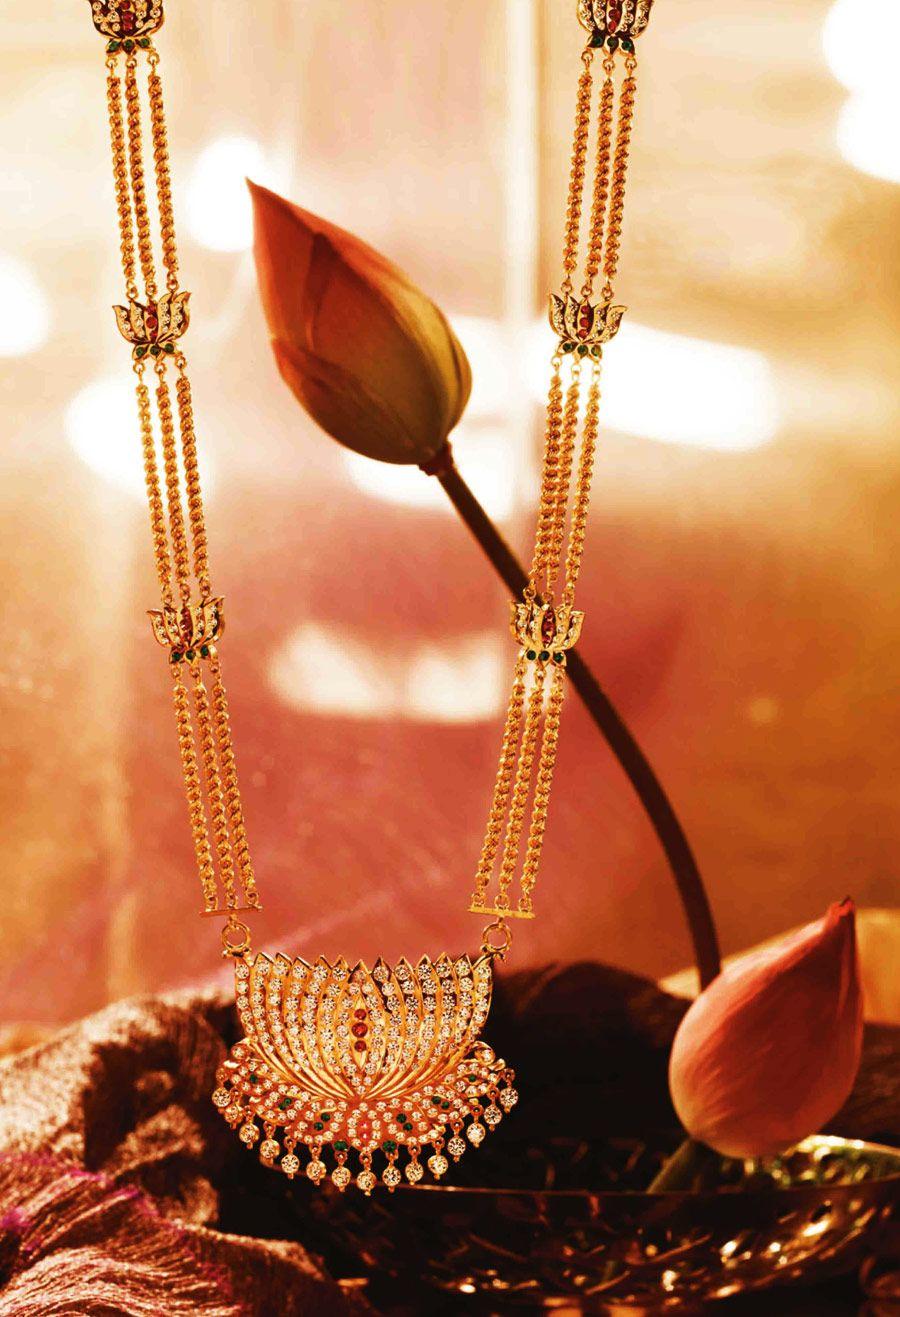 Pin by Annapurna Malineni on Jewellery | Pinterest | Indian ...